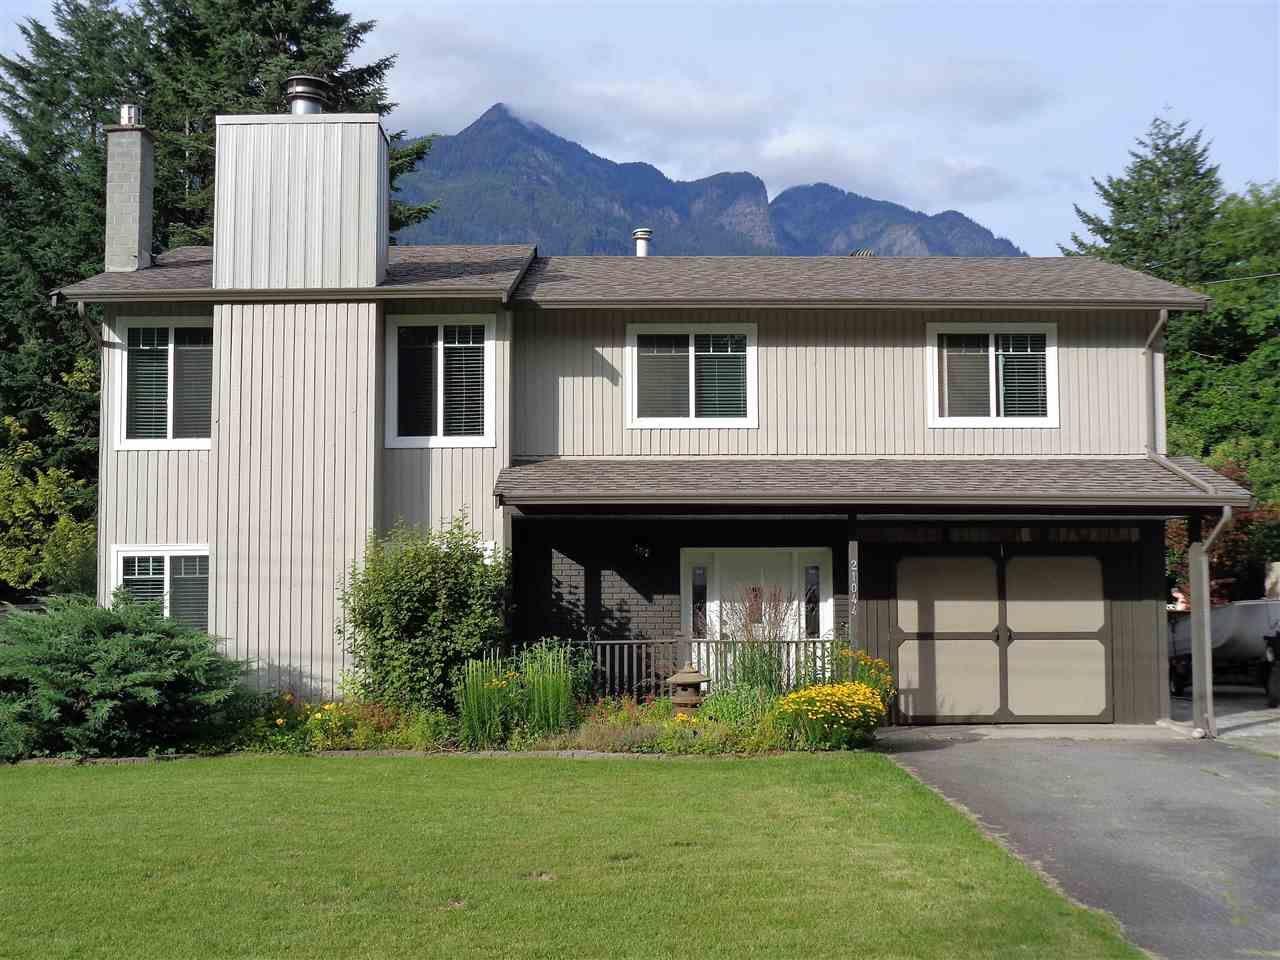 Main Photo: 21044 RIVERVIEW Drive in Hope: Hope Kawkawa Lake House for sale : MLS®# R2474466